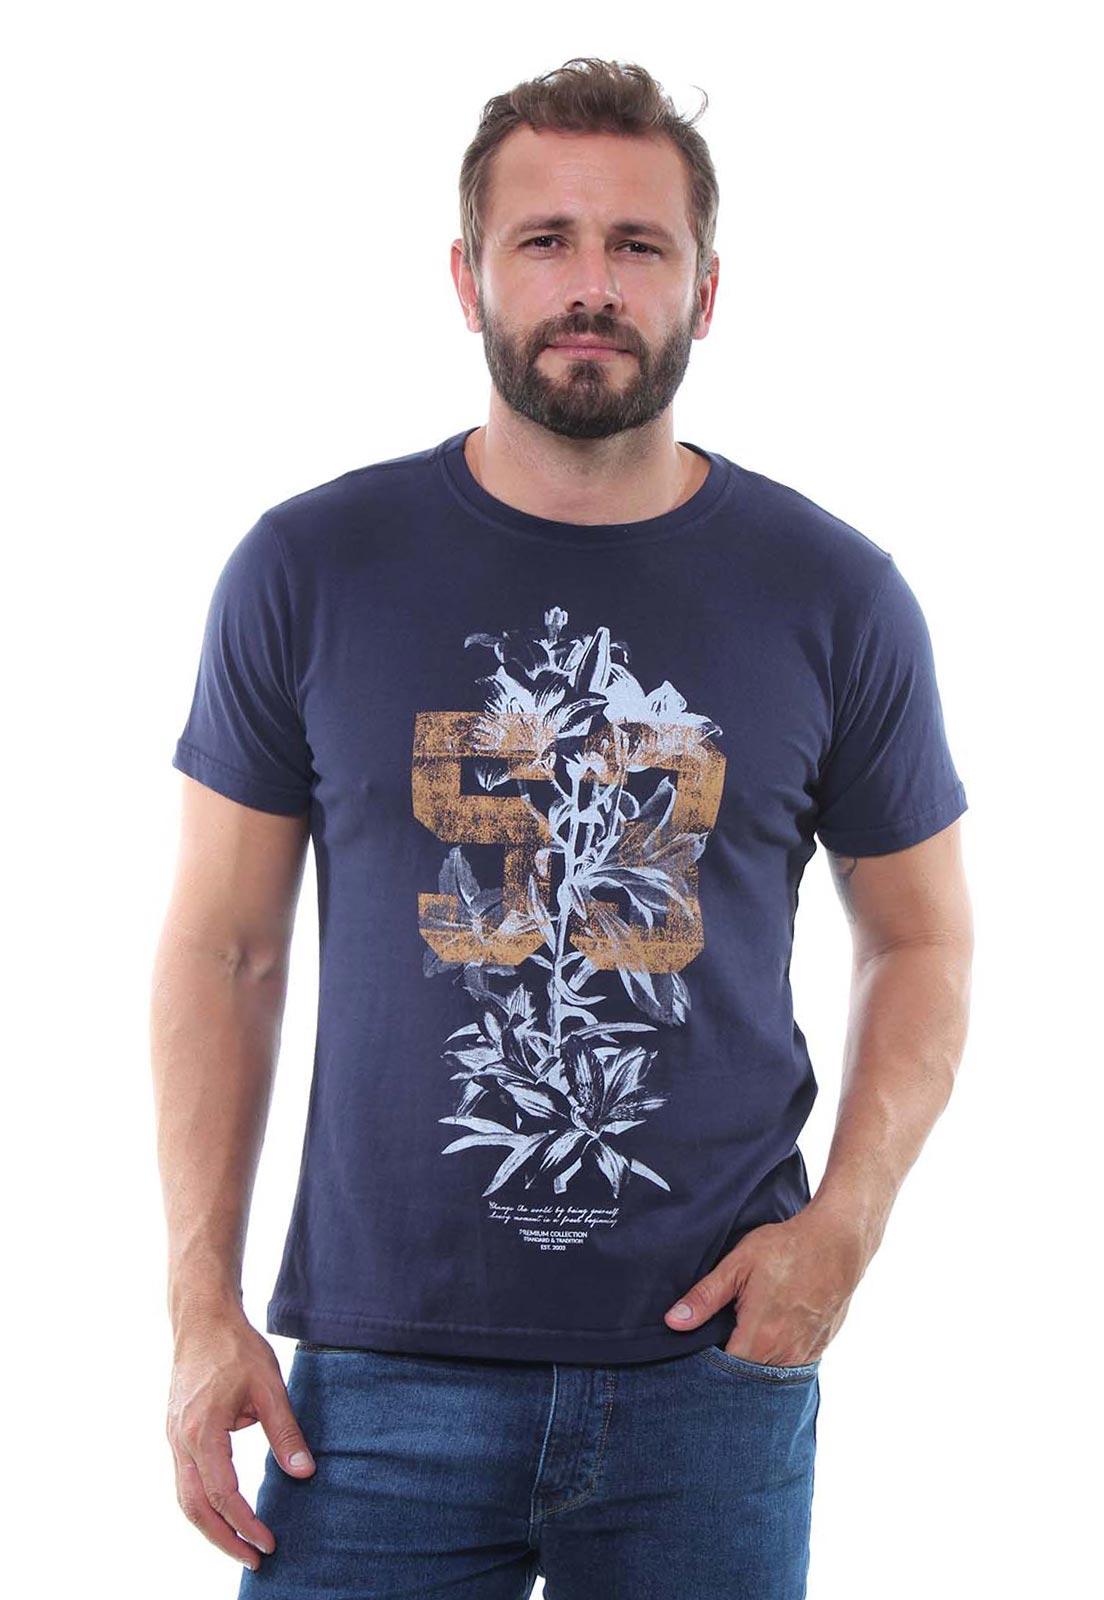 Camiseta Masculina Manga Curta Crocker - 47991  - CROCKER JEANS